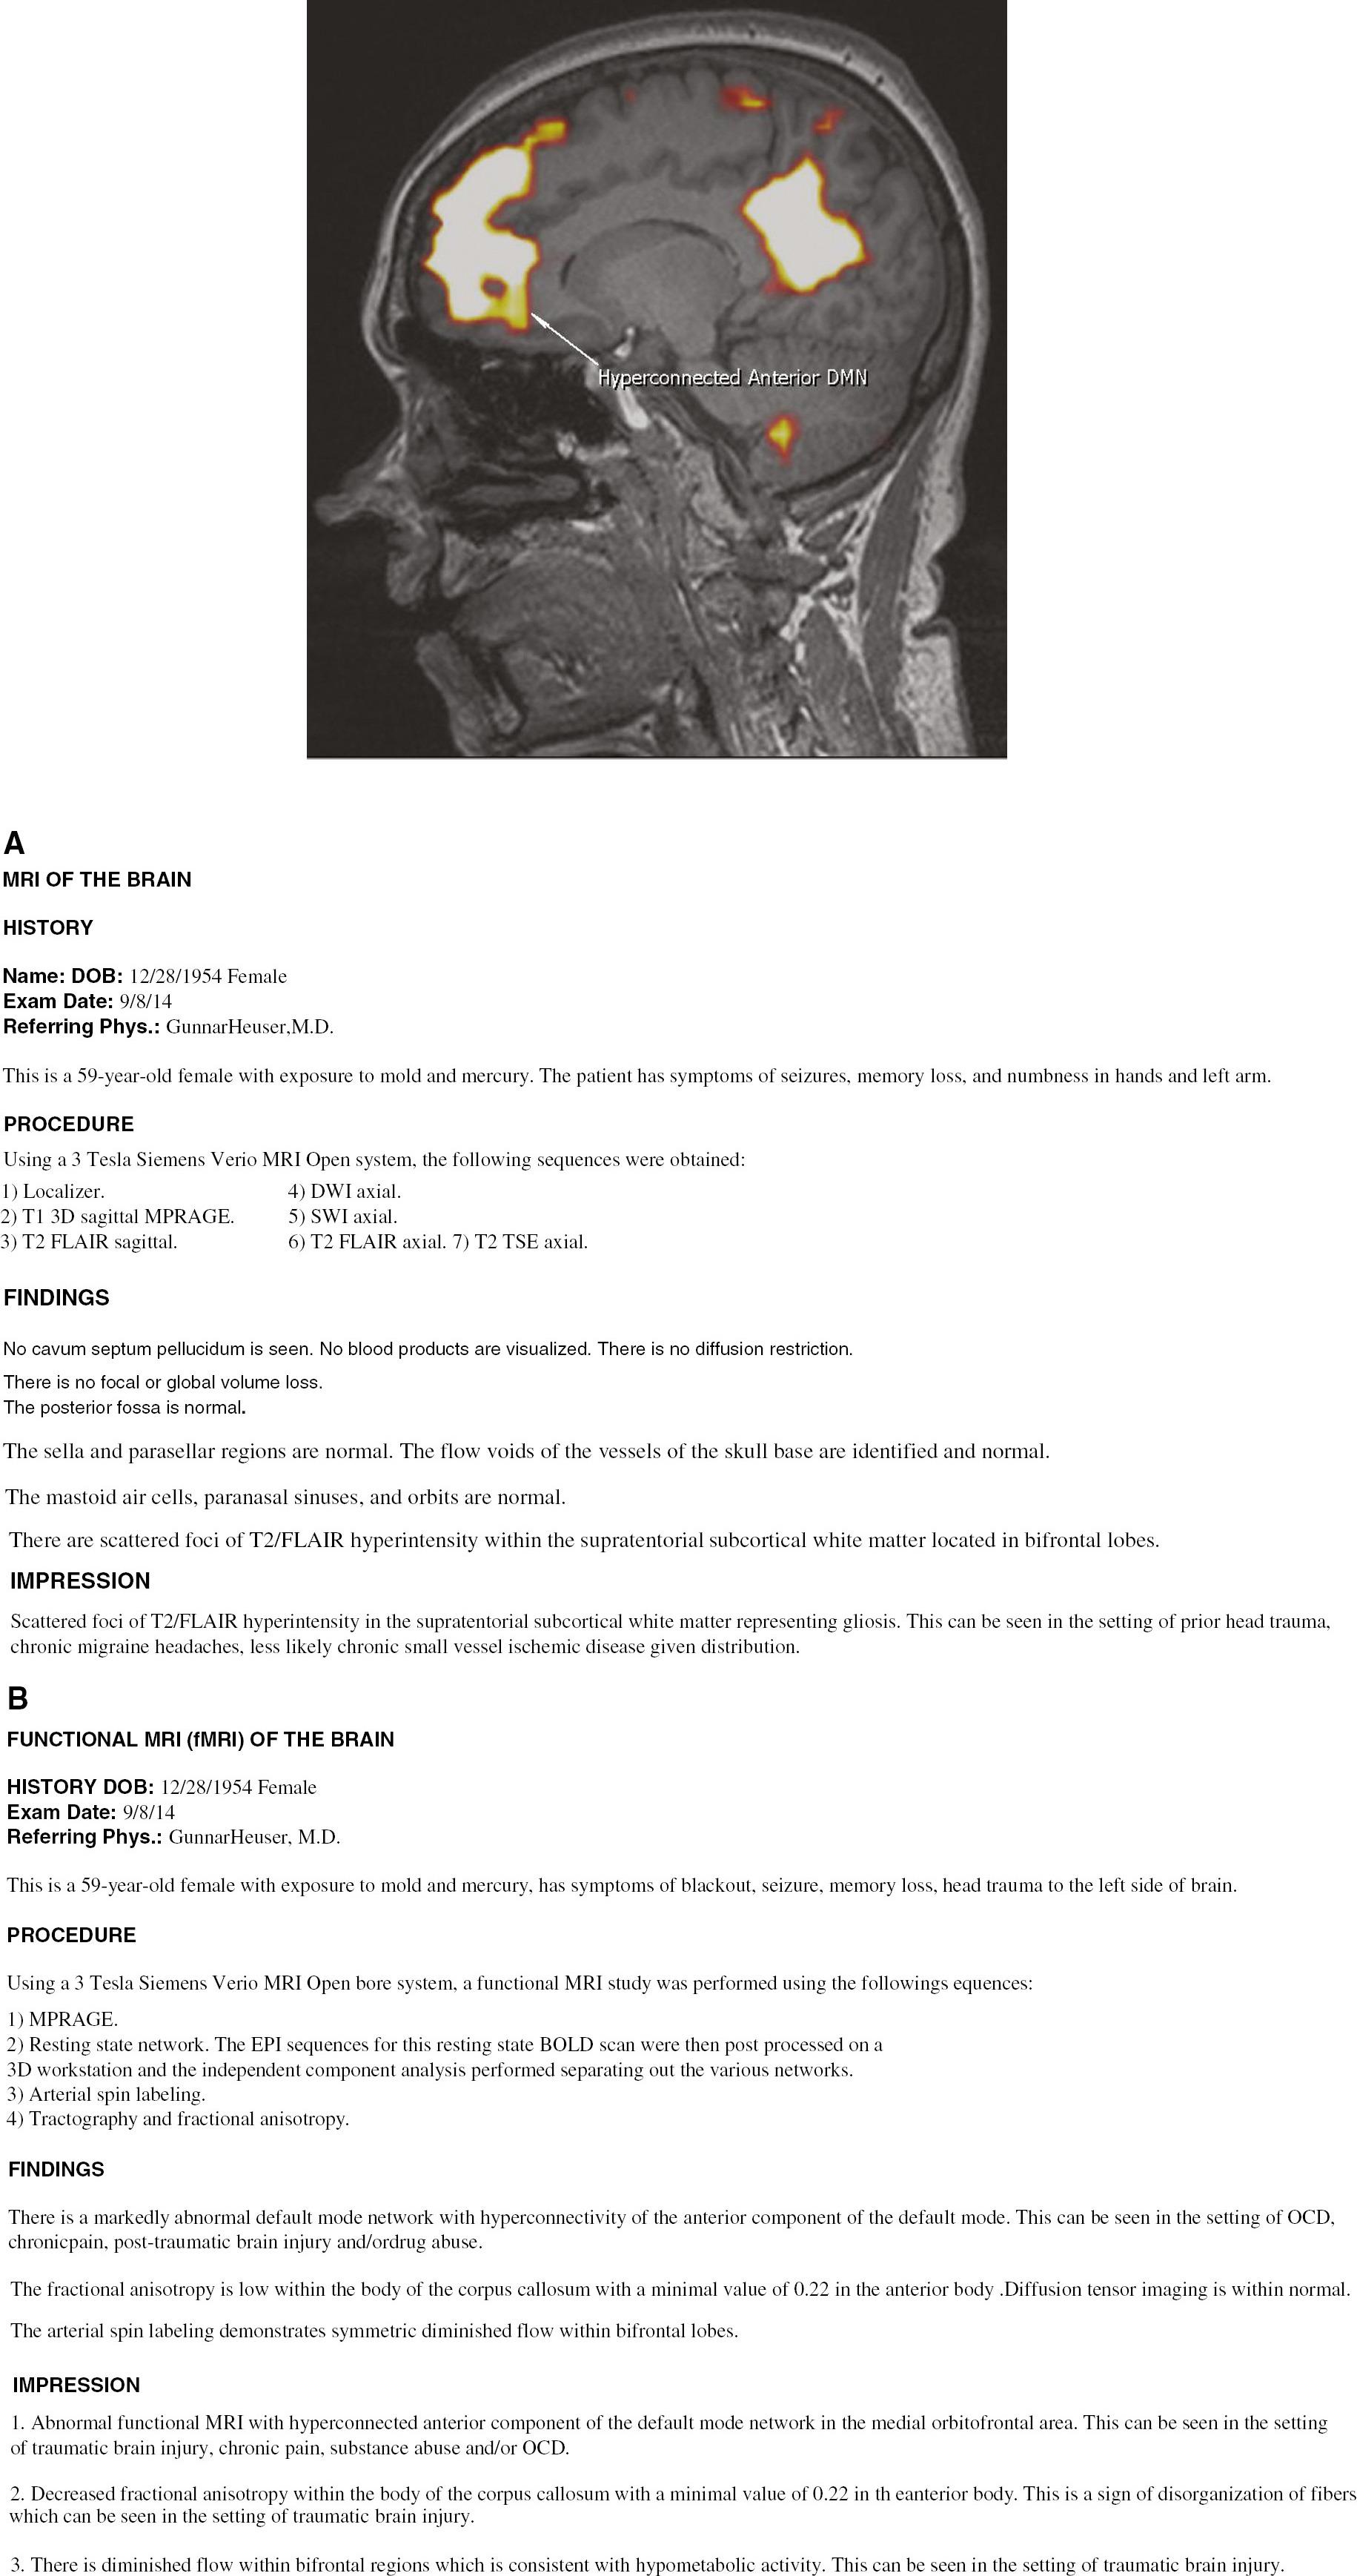 radiologist report